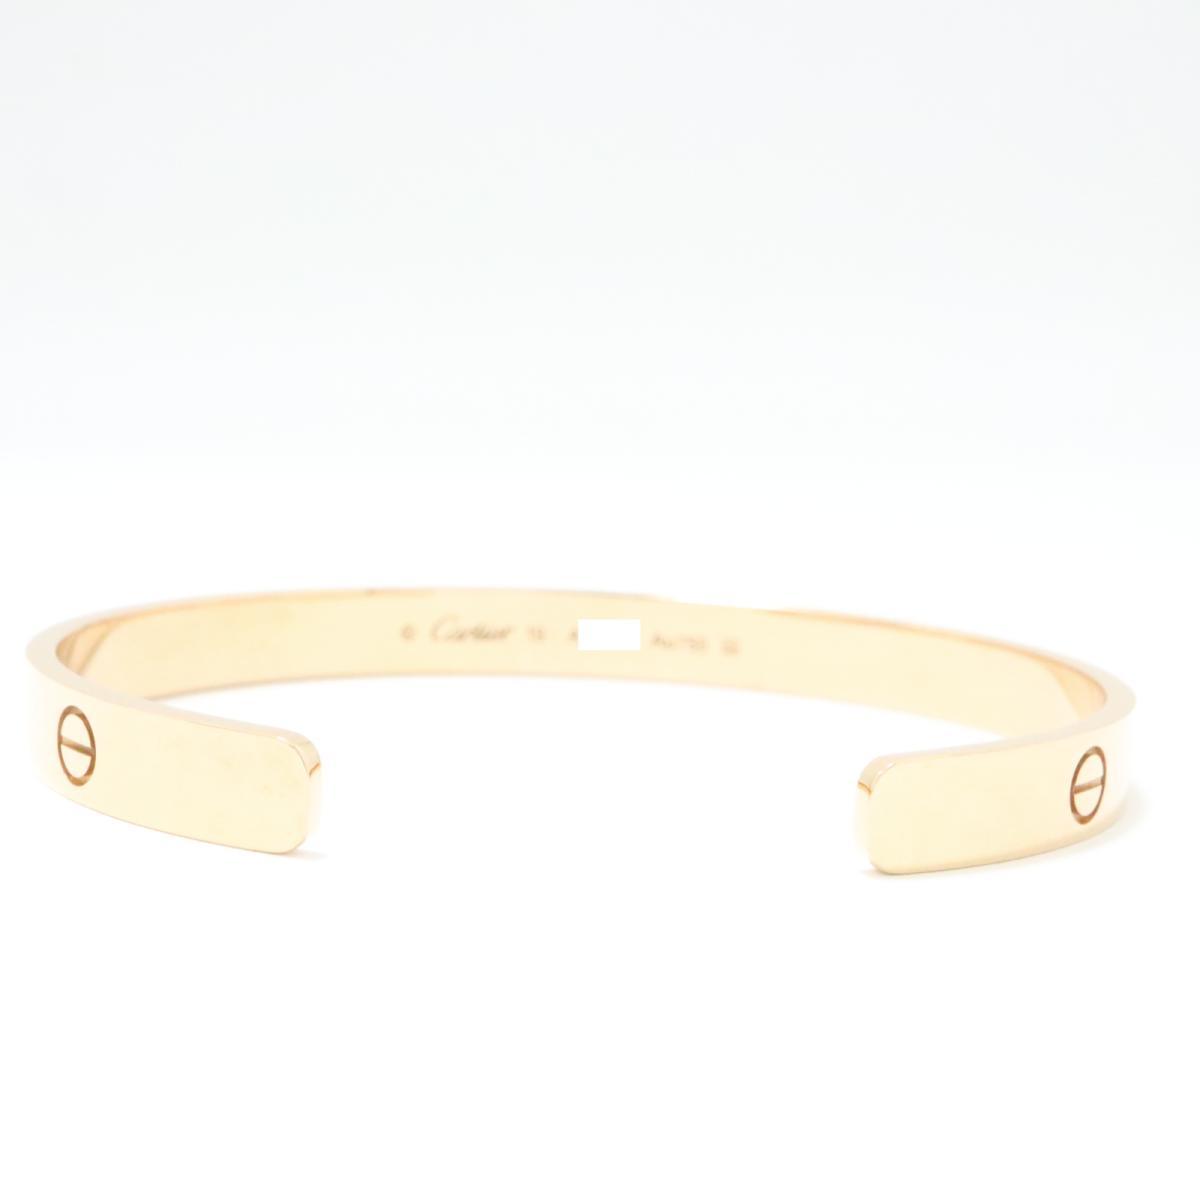 6e26ac558c6db ... Auth Cartier Love Bracelet Open Bangle #19 18KPG 750 Pink Rose Gold  Used Vintage ...